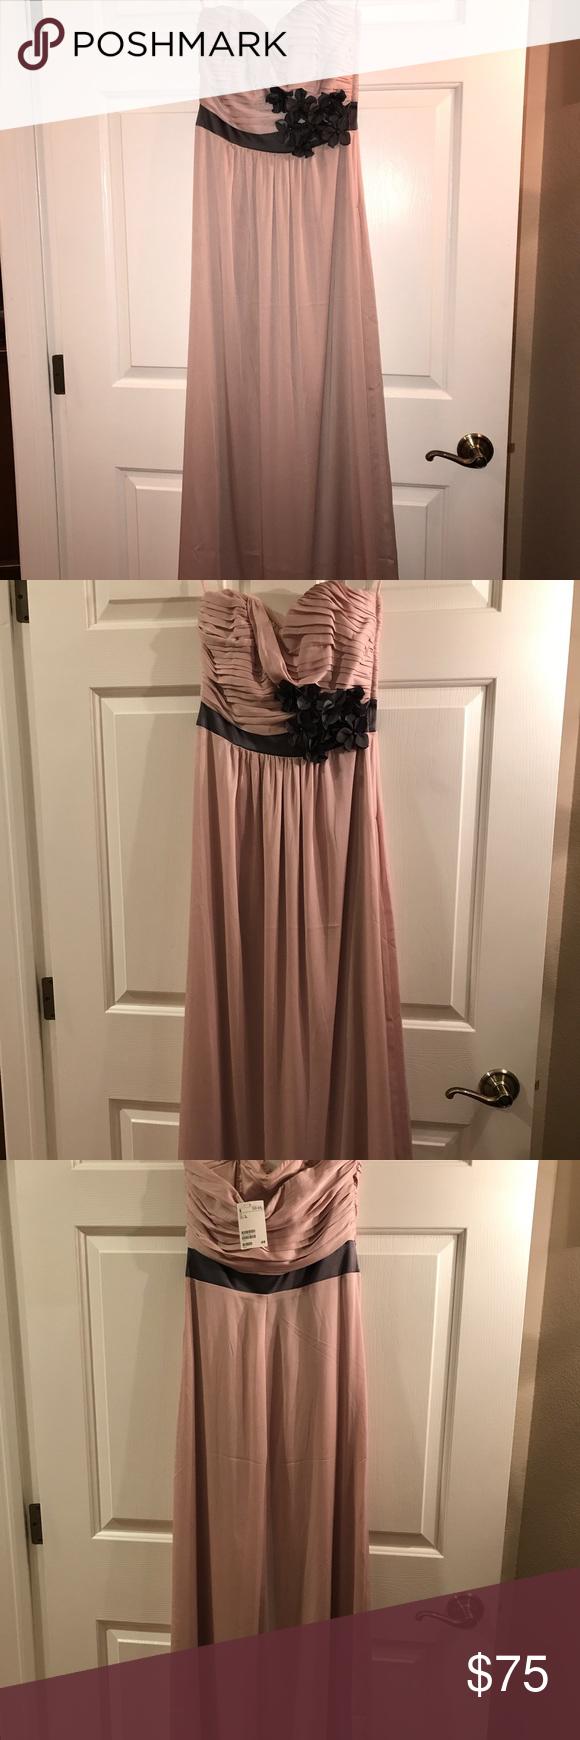 H&m dusty pink dress  Strapless flowy dusty rose colored dress Strapless dusty rose